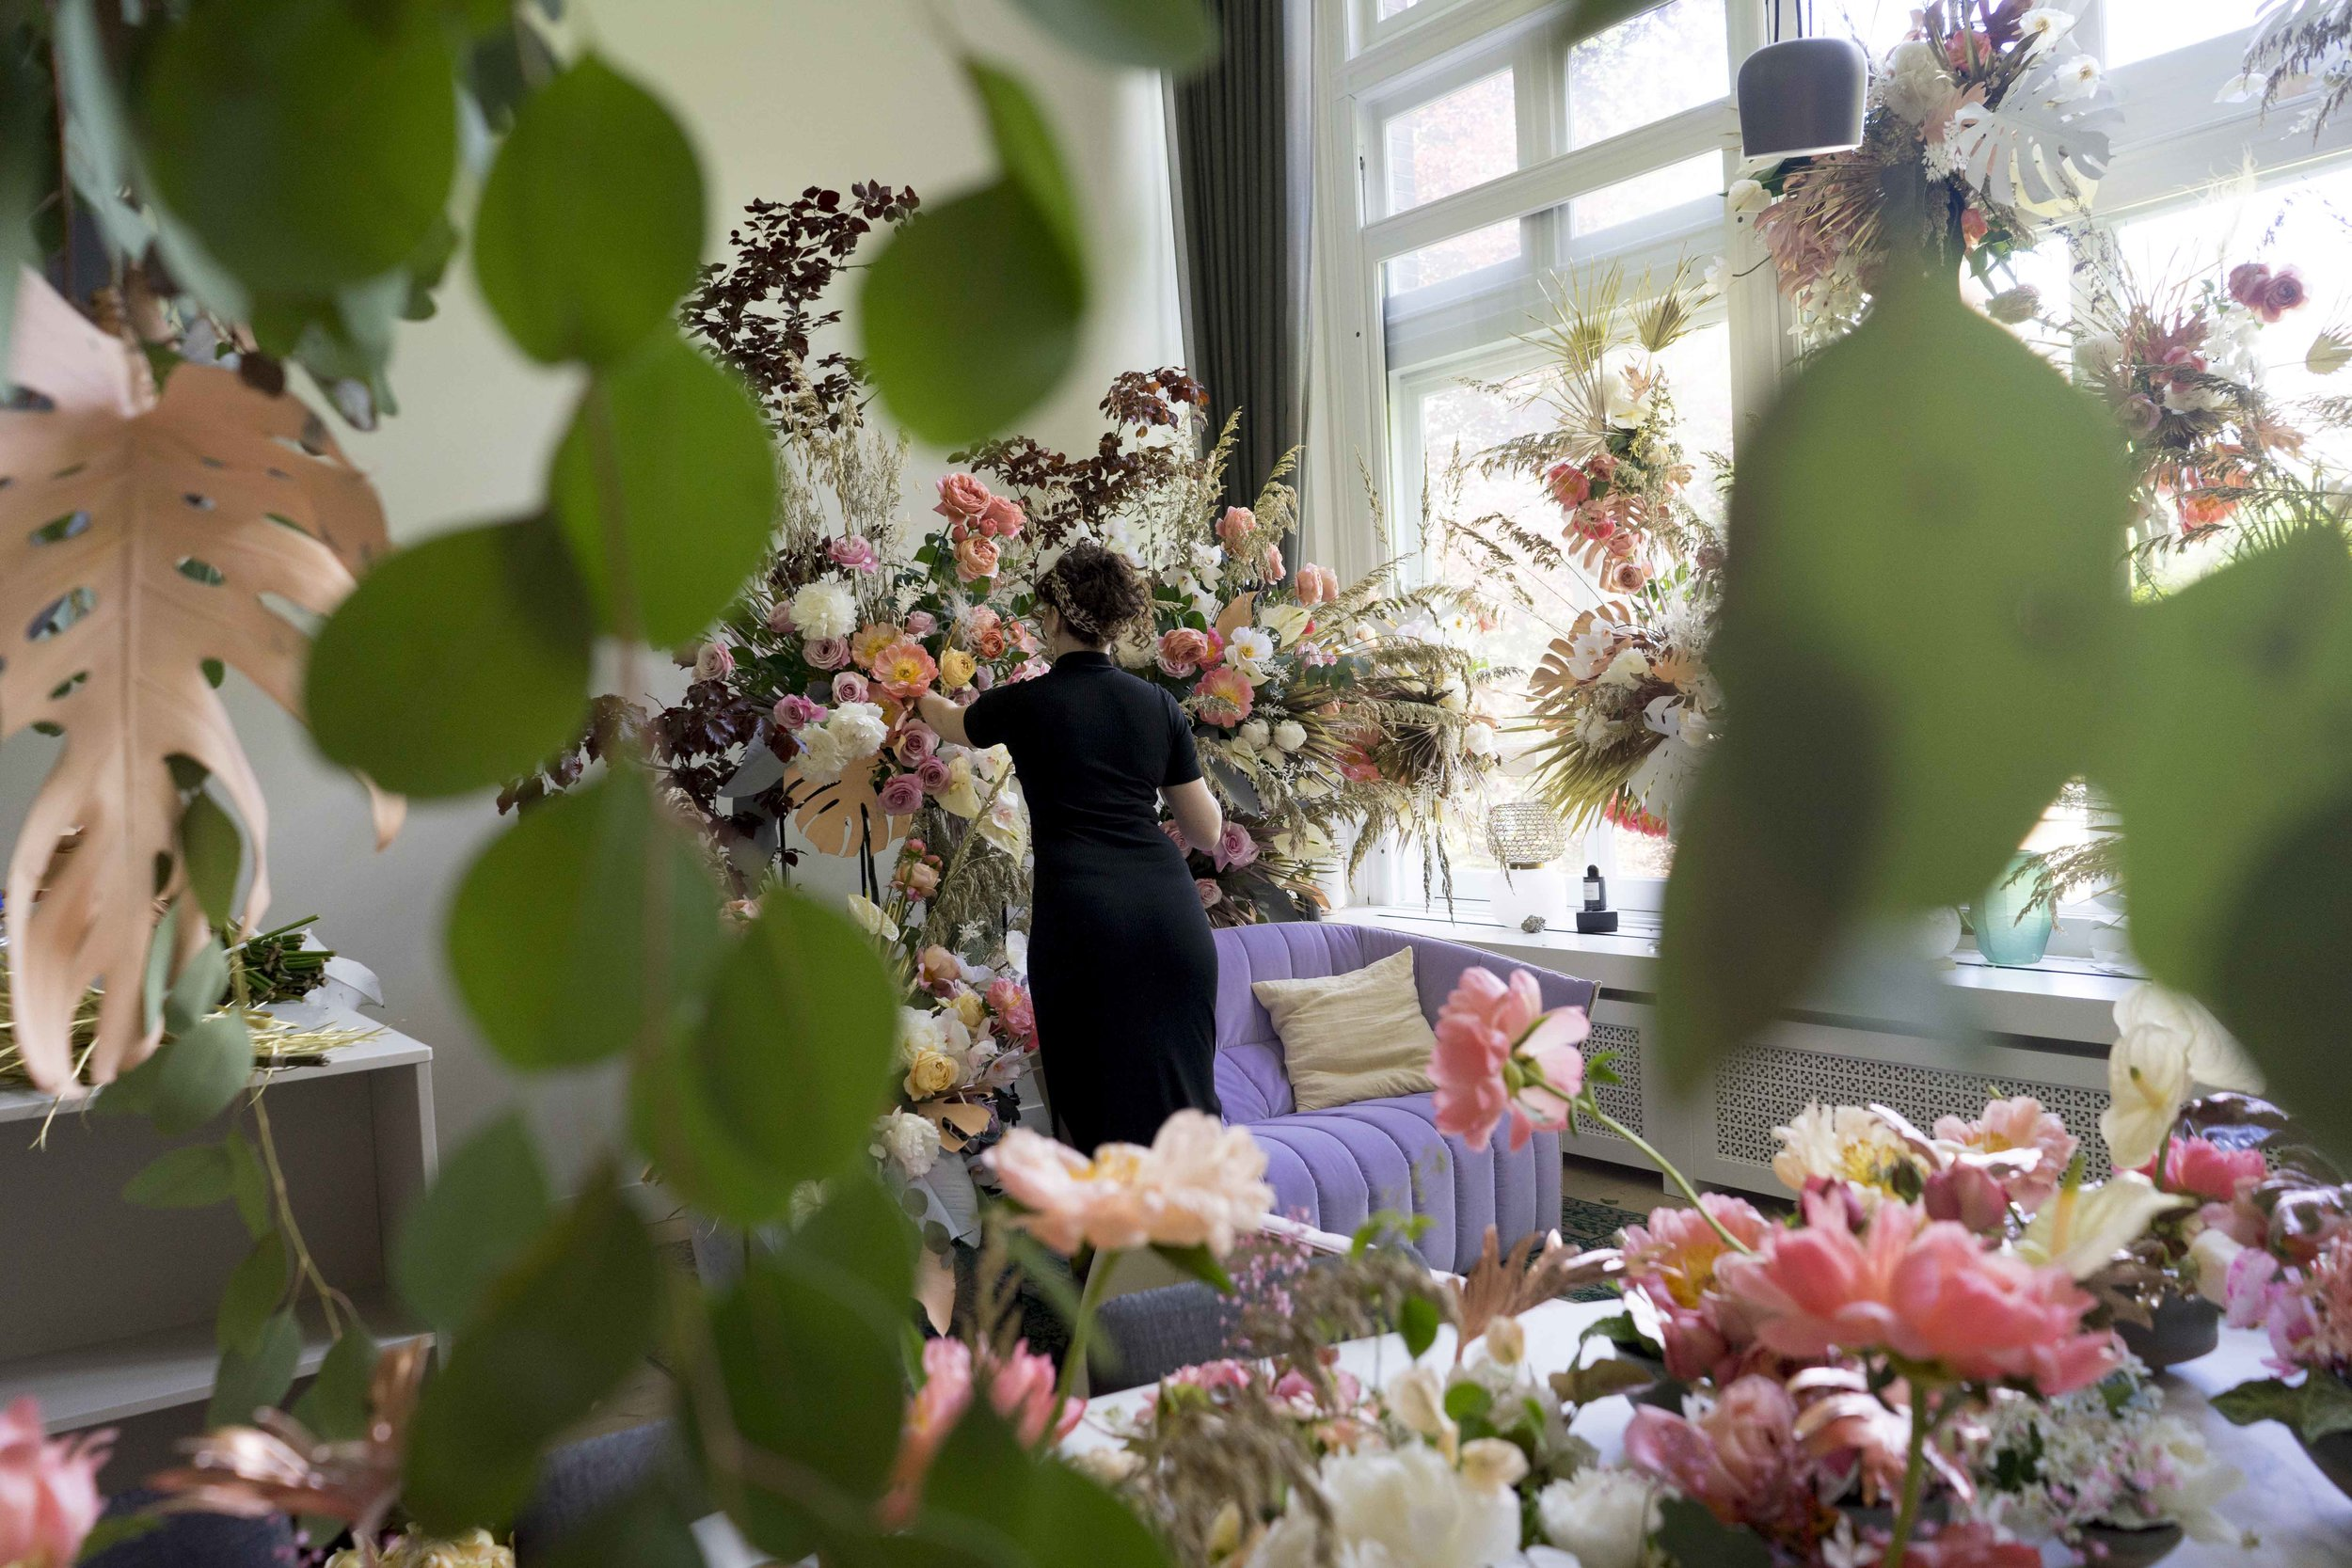 #apbloem #florist #bloemist #amsterdam #bloemen #kerkstraat #trouwen #event #love #liefde #bloemen #flowers #wedding #bruiloft #dscolor #dsfloral #weddingstyling #peony